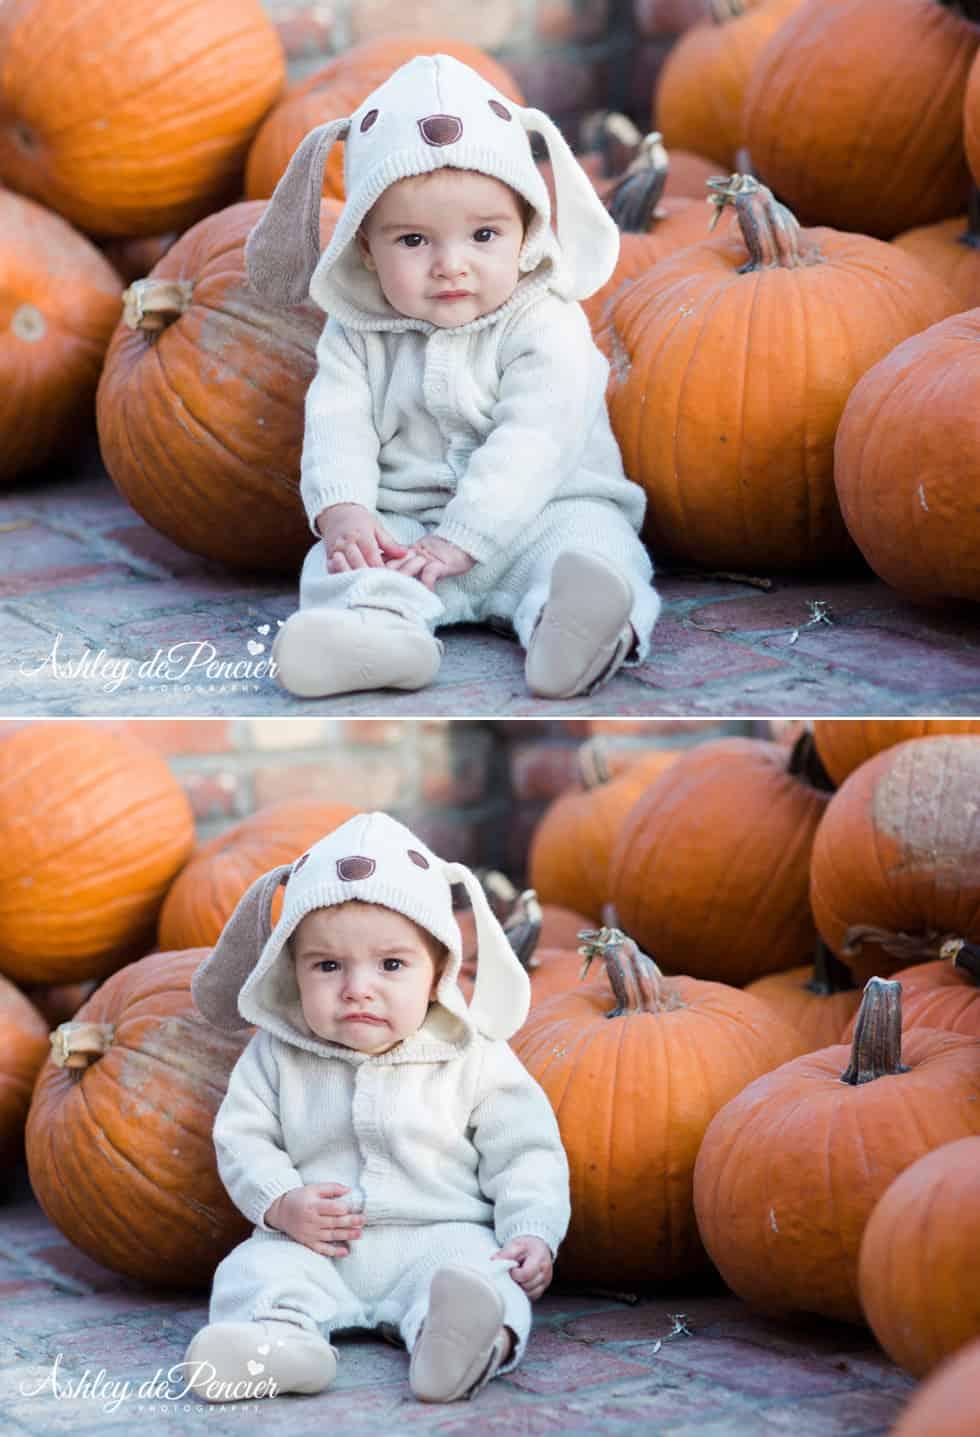 Little boy dressed in his halloween costume